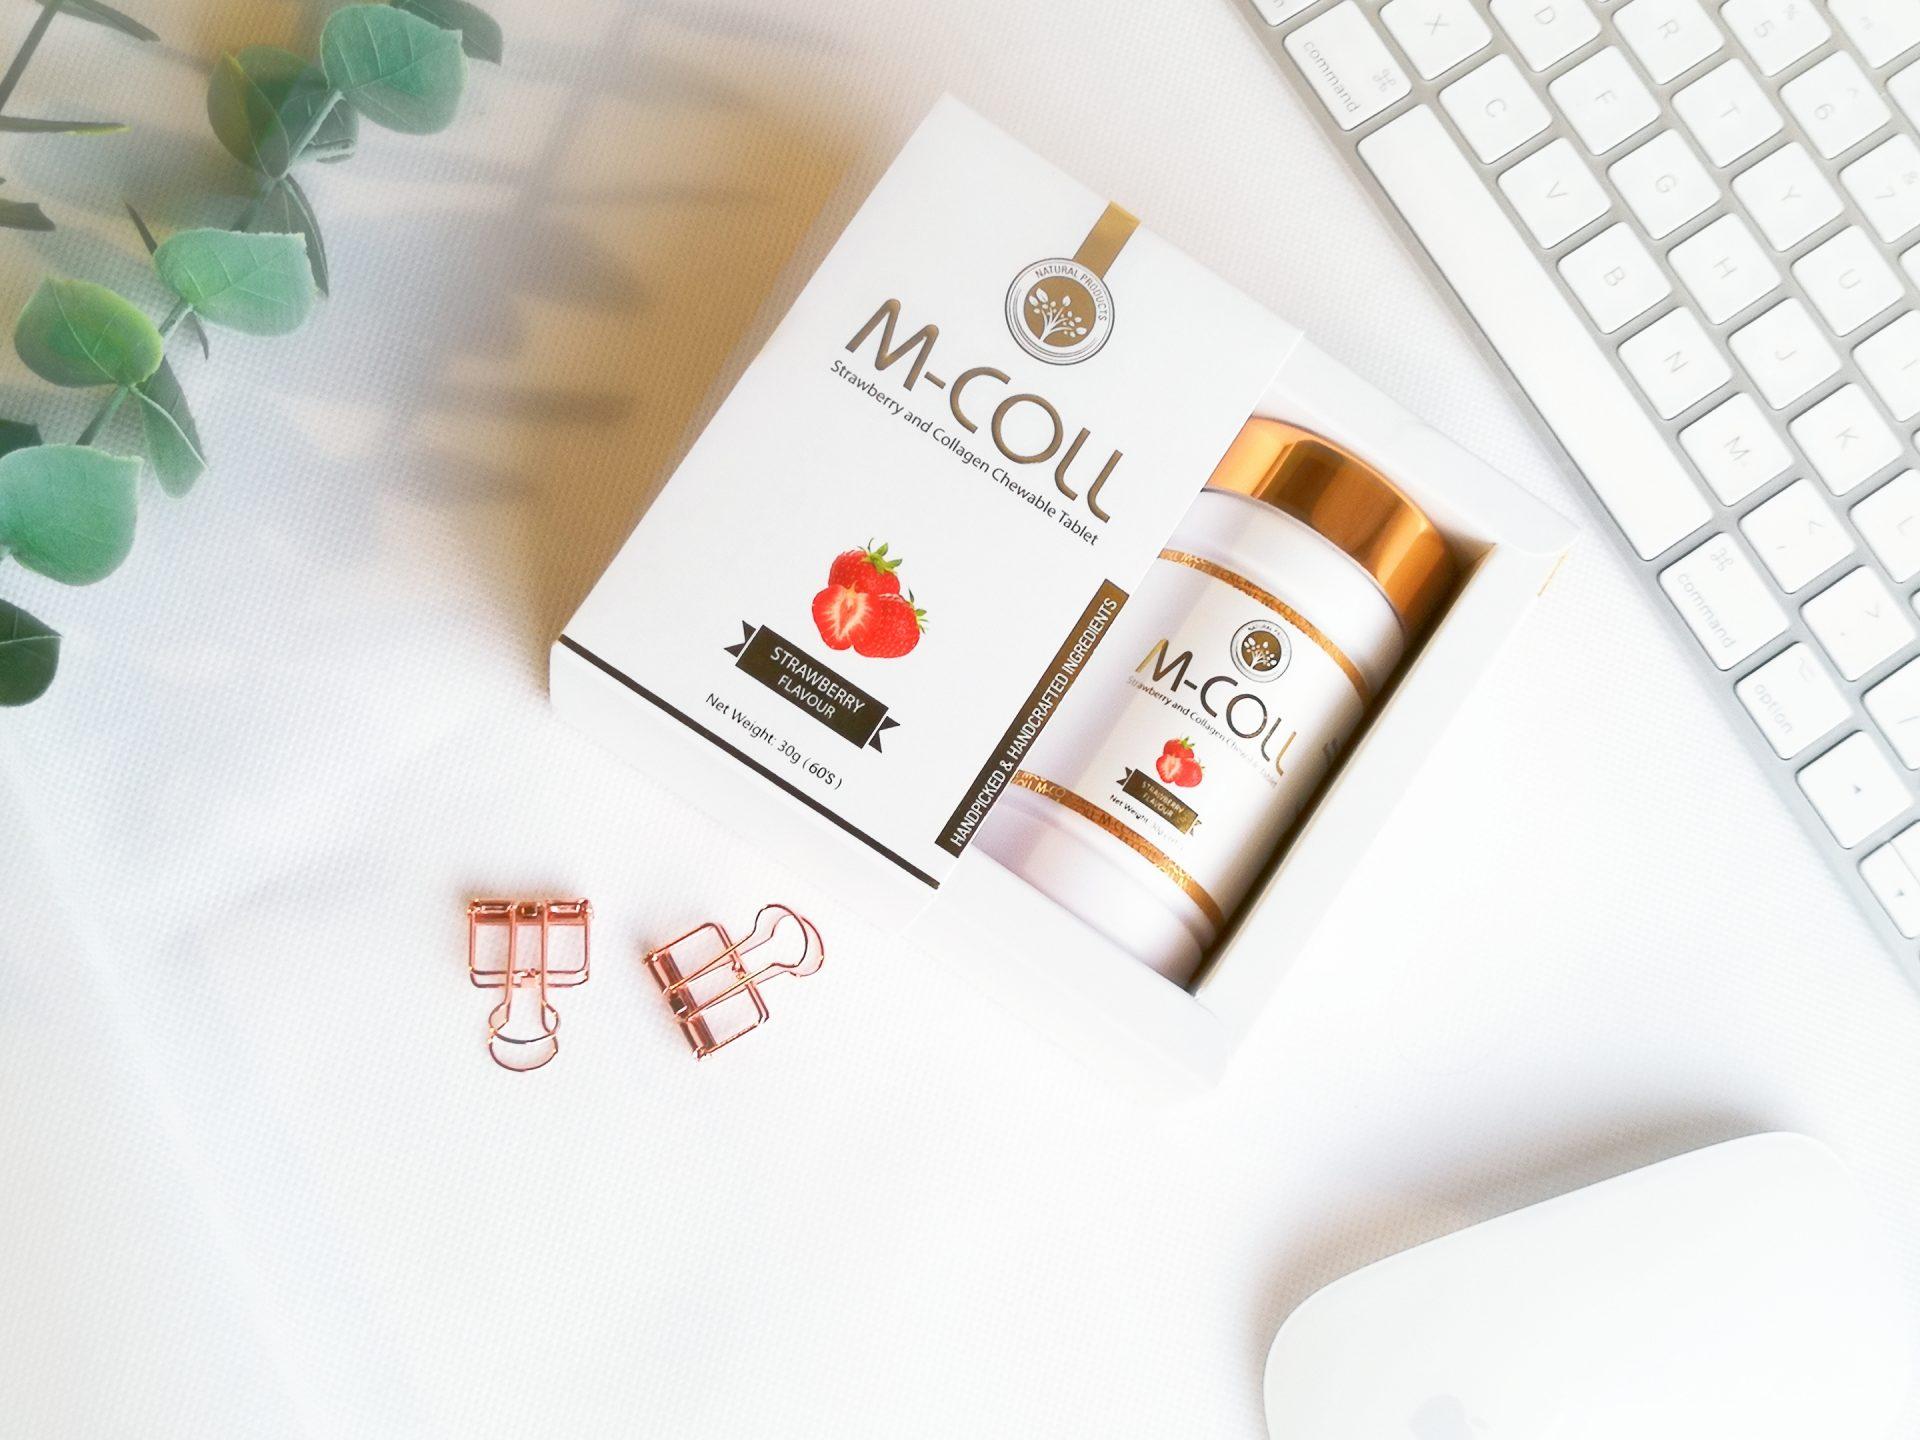 Wellous M-Coll Collagen MyVpsGroup-51